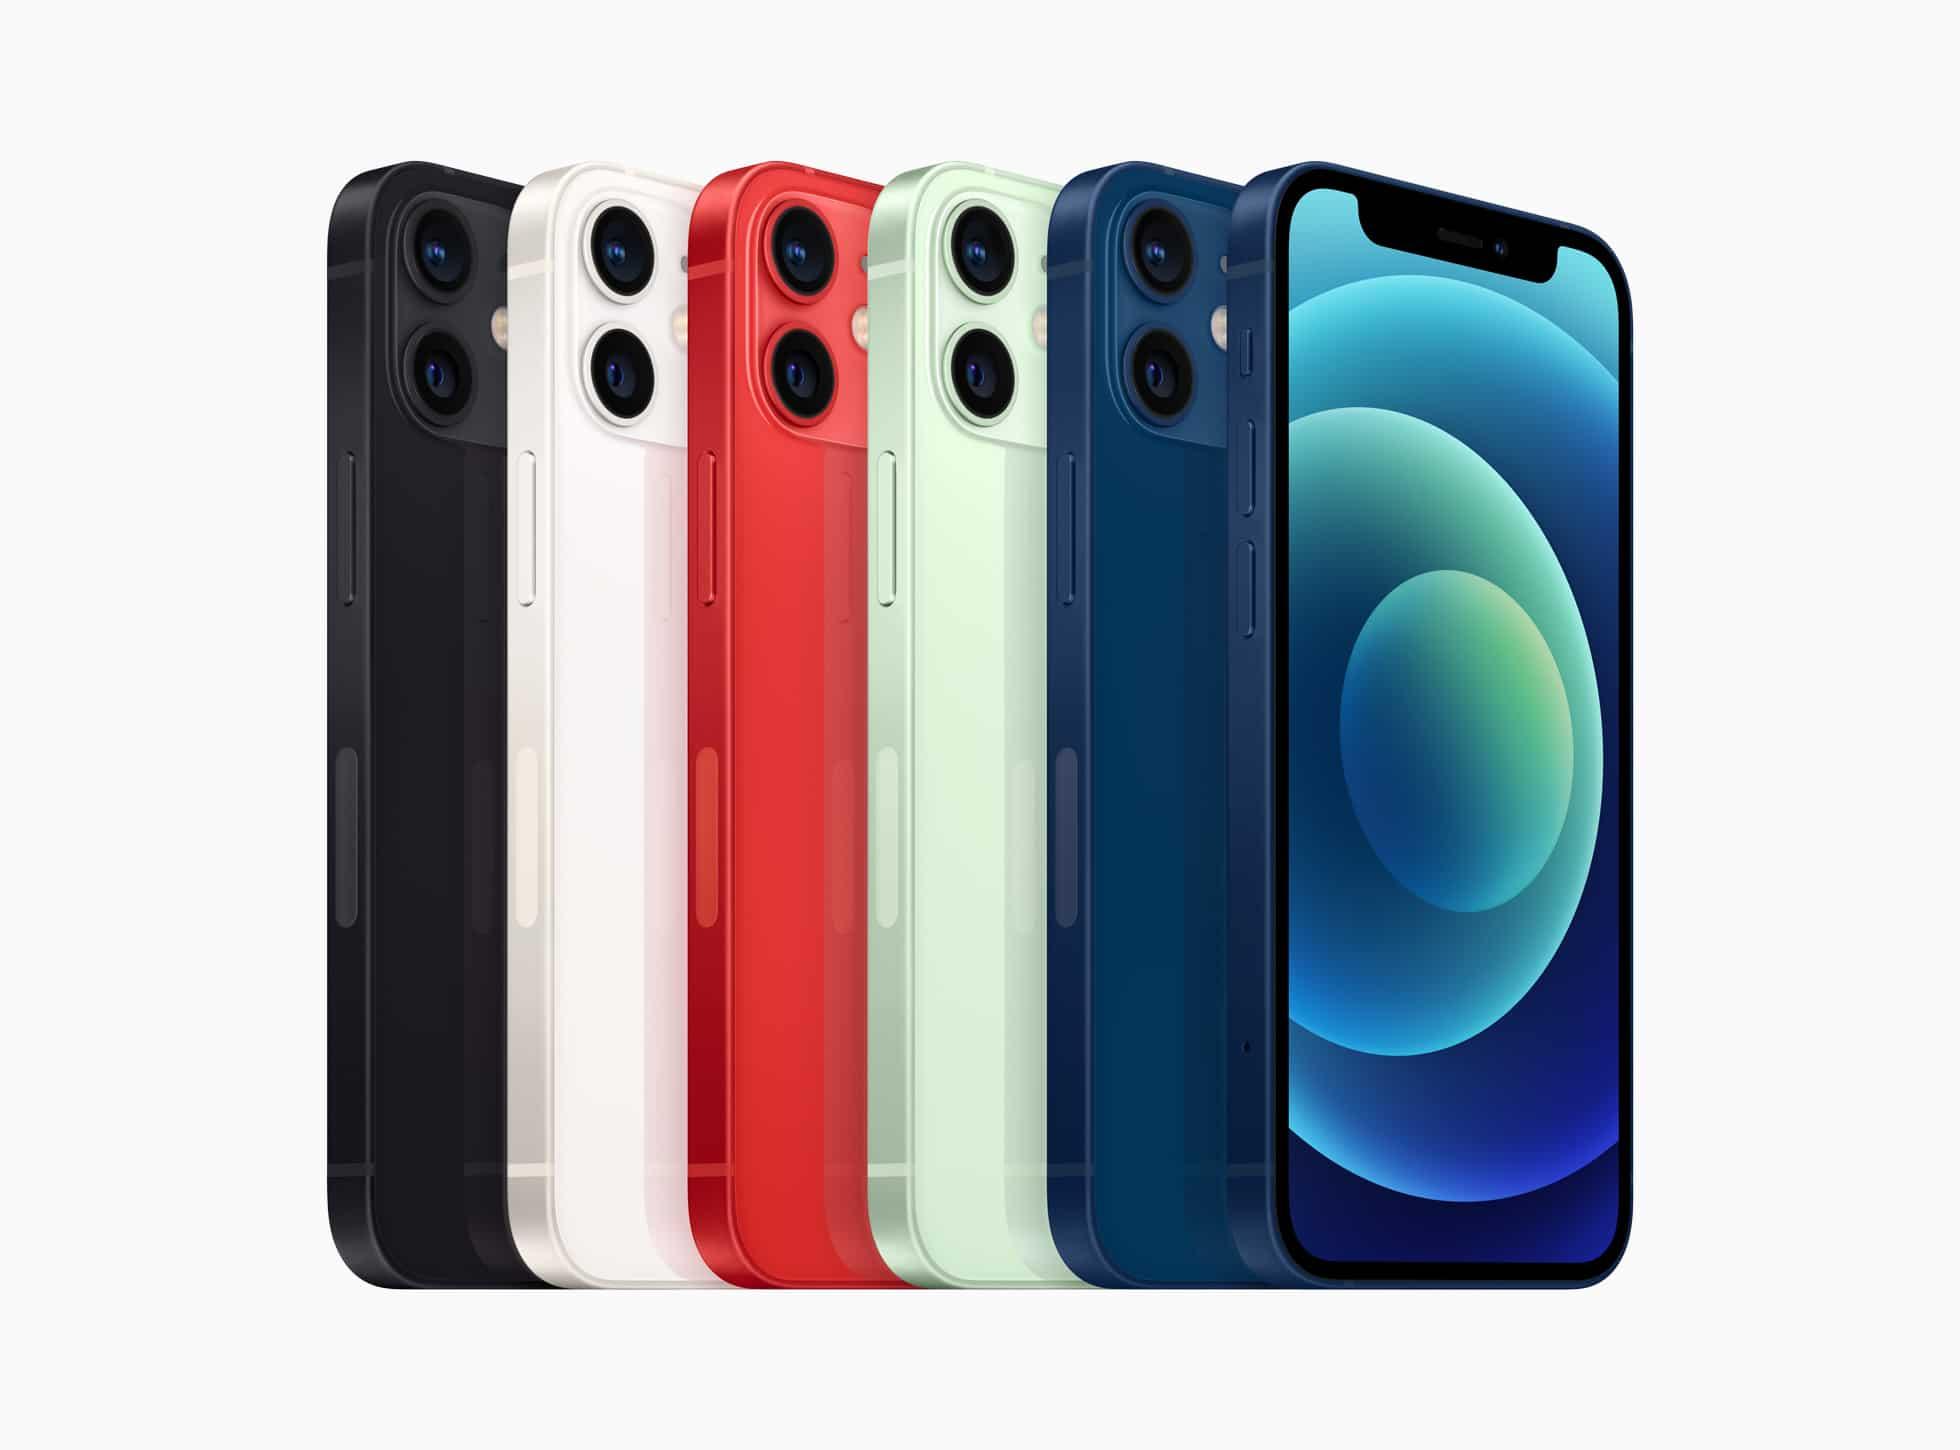 Família de iPhones 12 mini em todas as cores